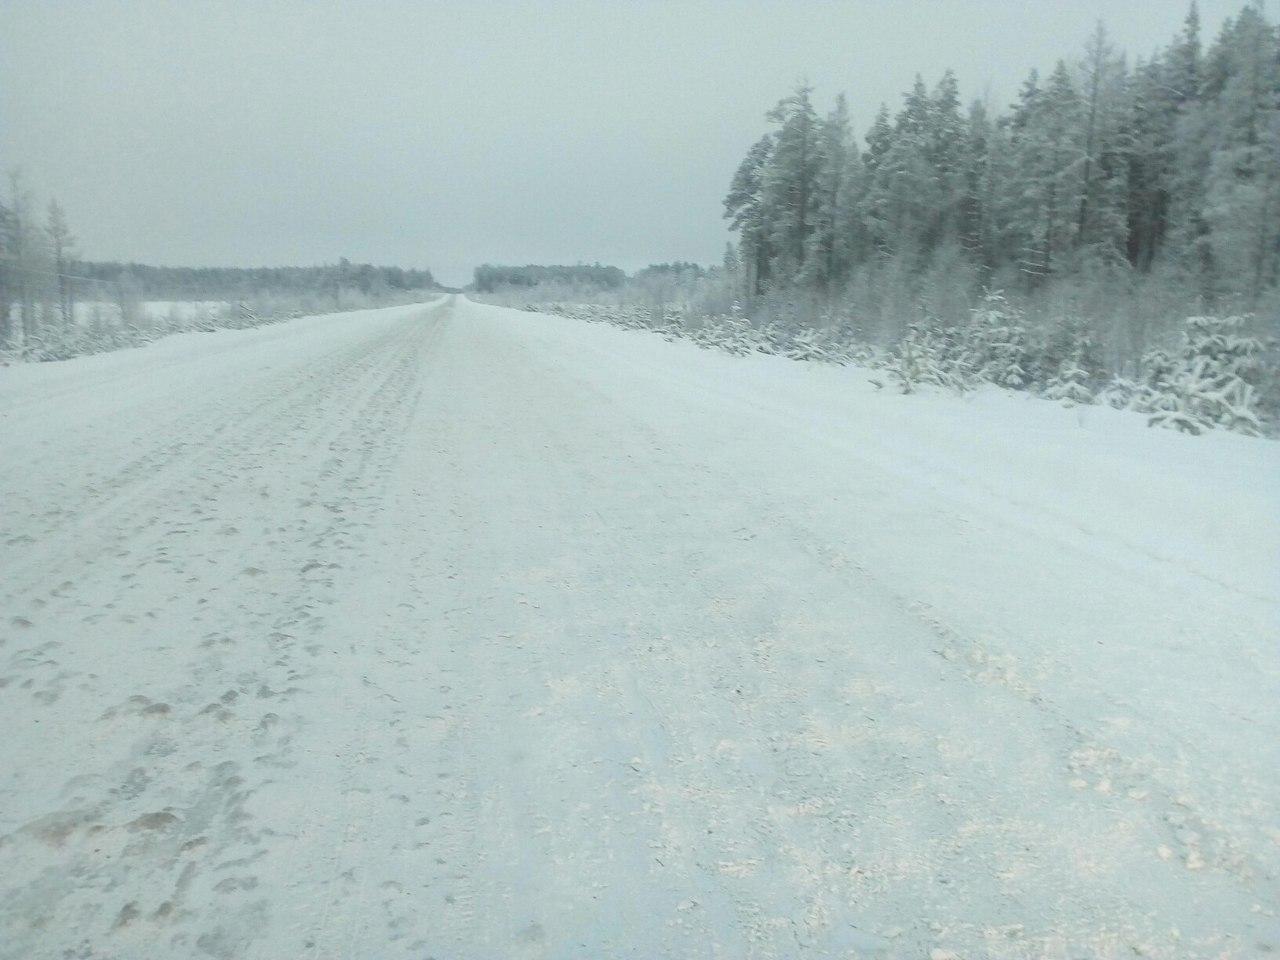 Ледяной накат на дорогах Карелии